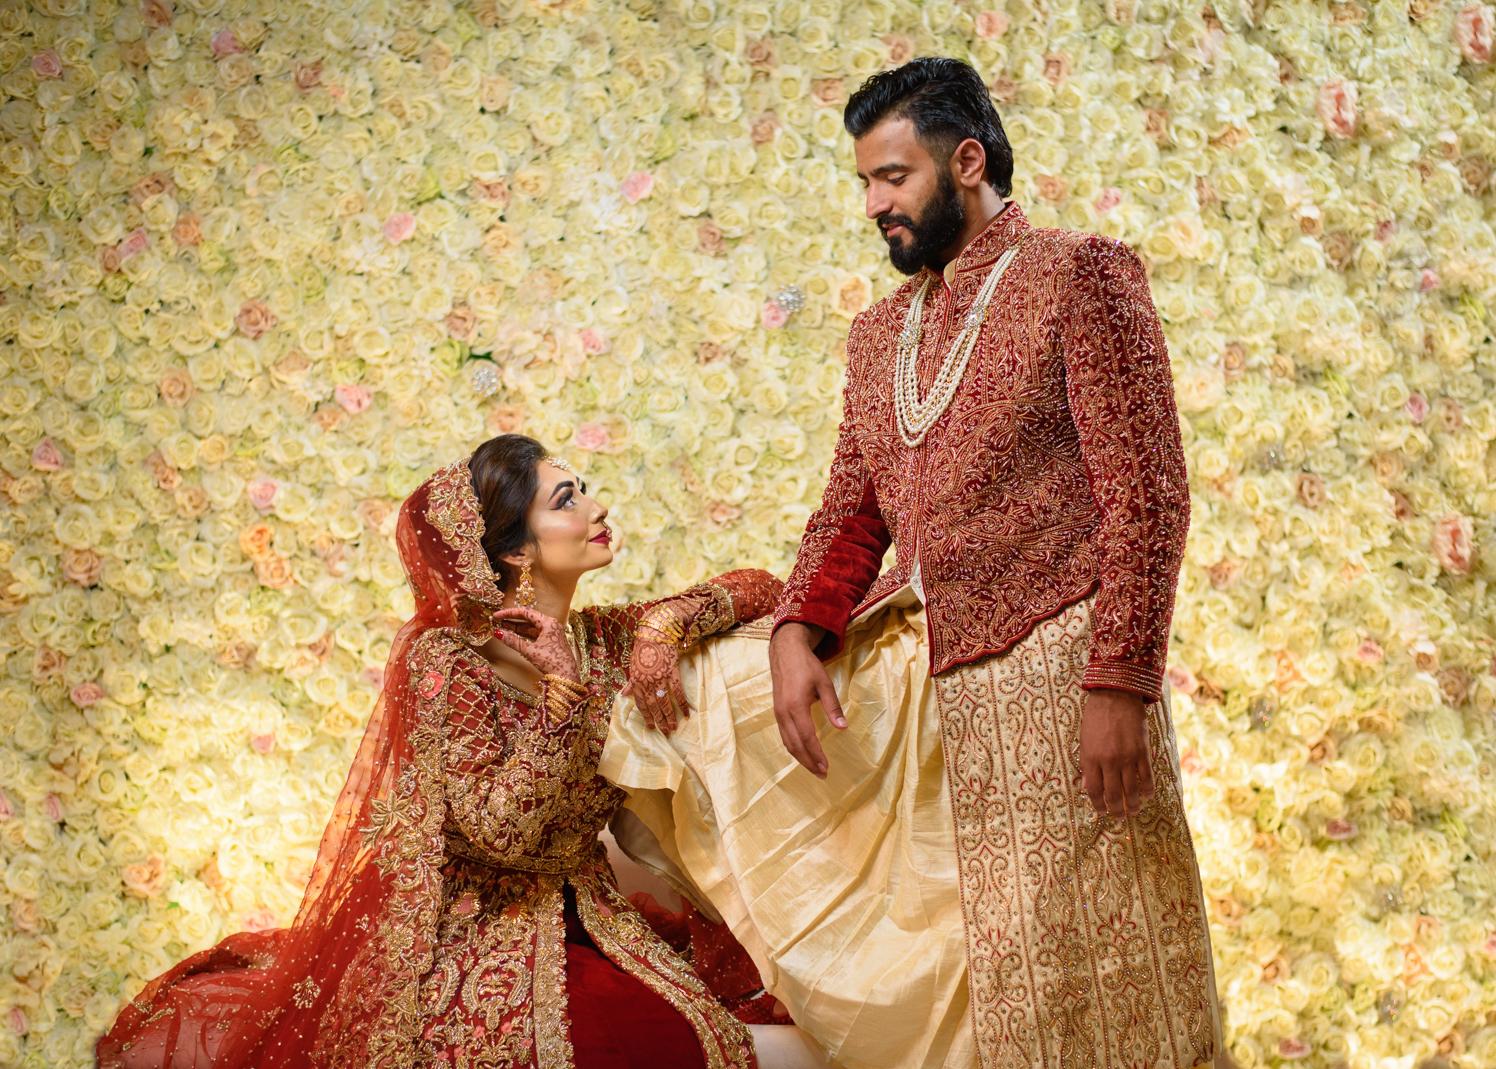 2018-08-12 Ayesha Bilal Wedding (0524)_1.jpg